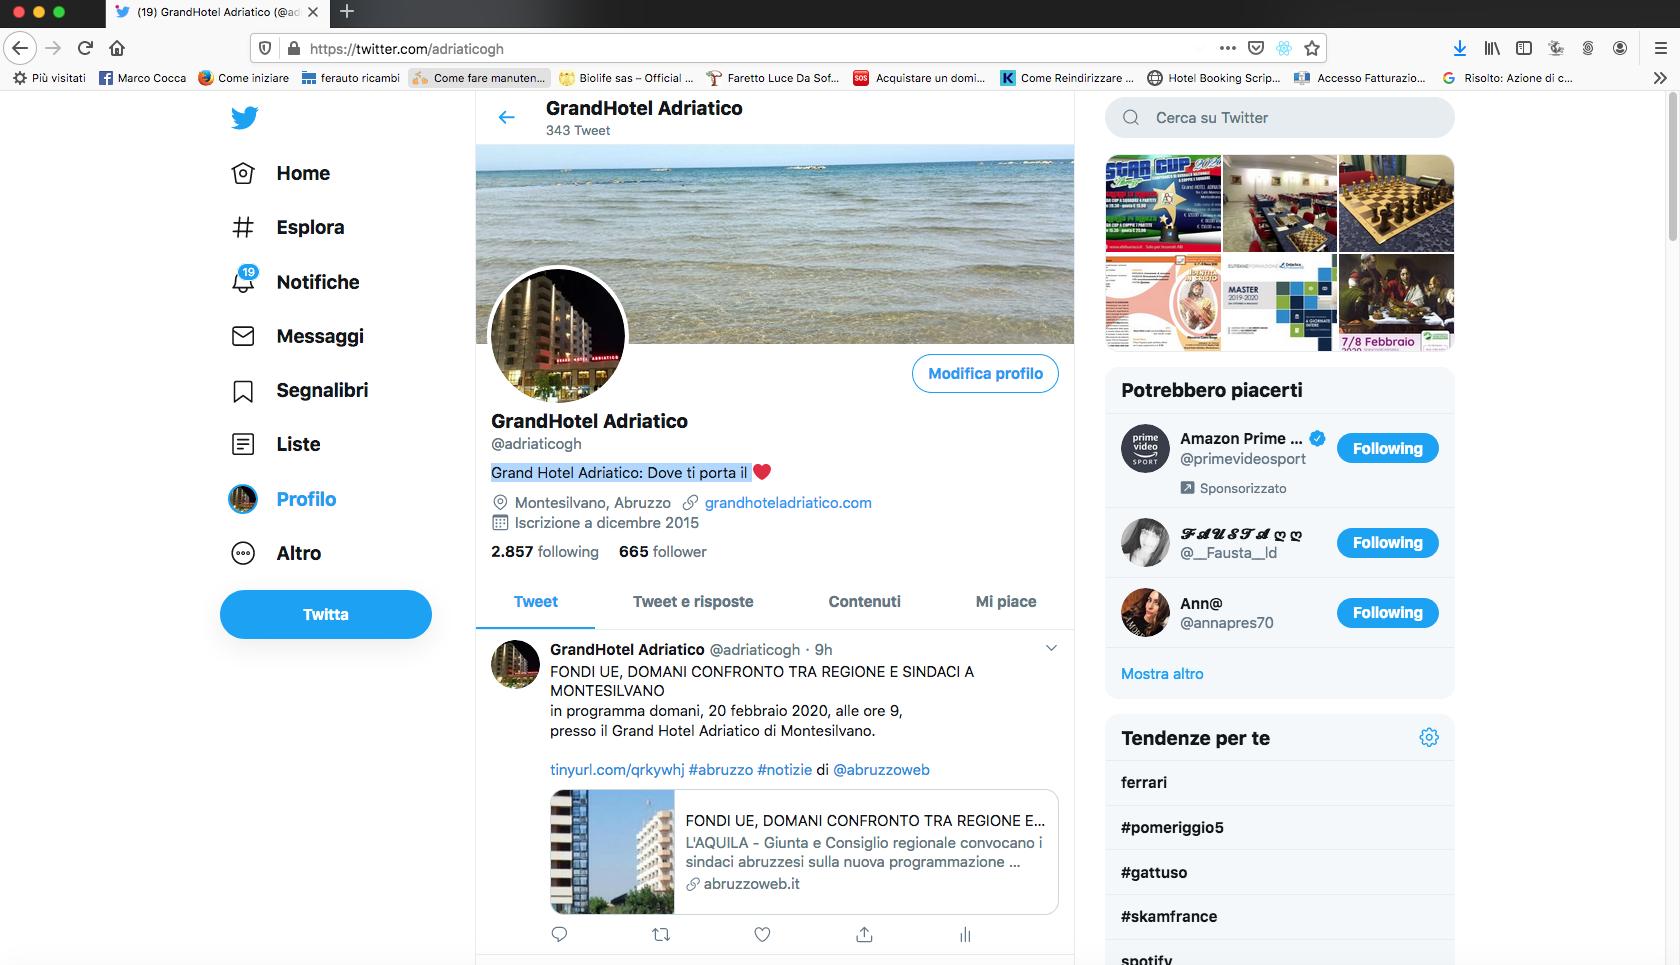 grand hotel adriatico twitter